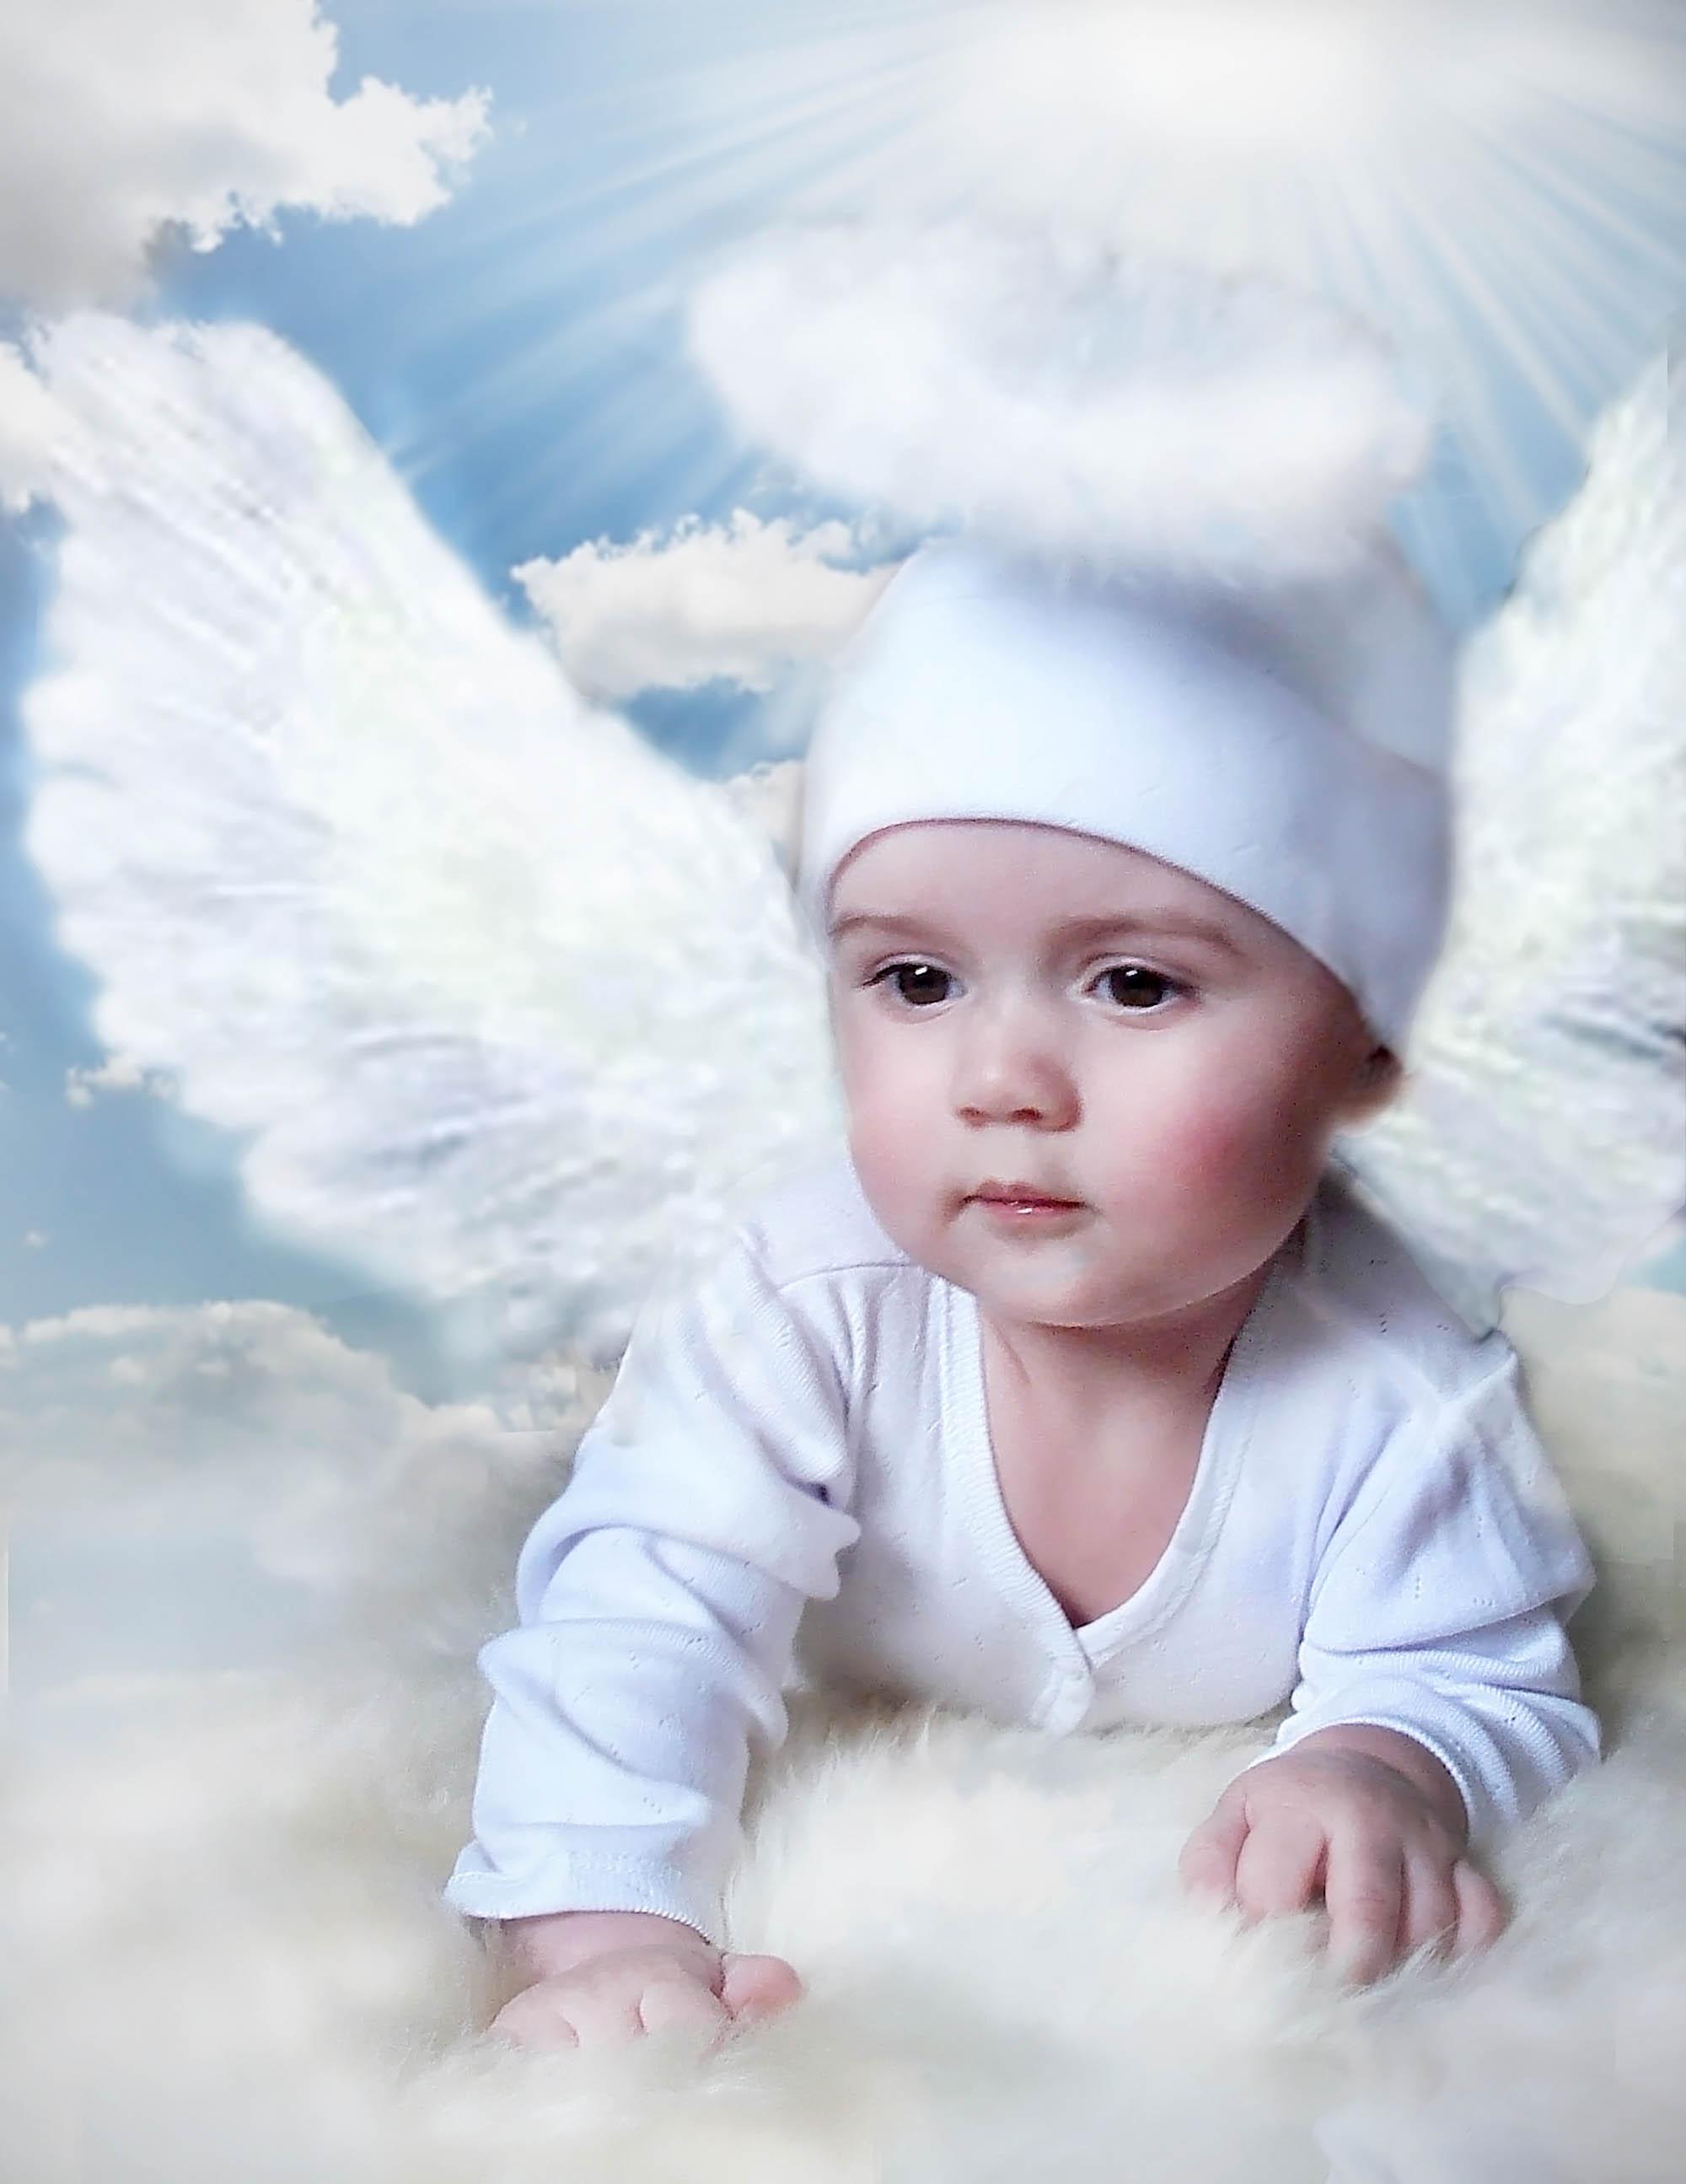 Красивое фото ангела ребенка